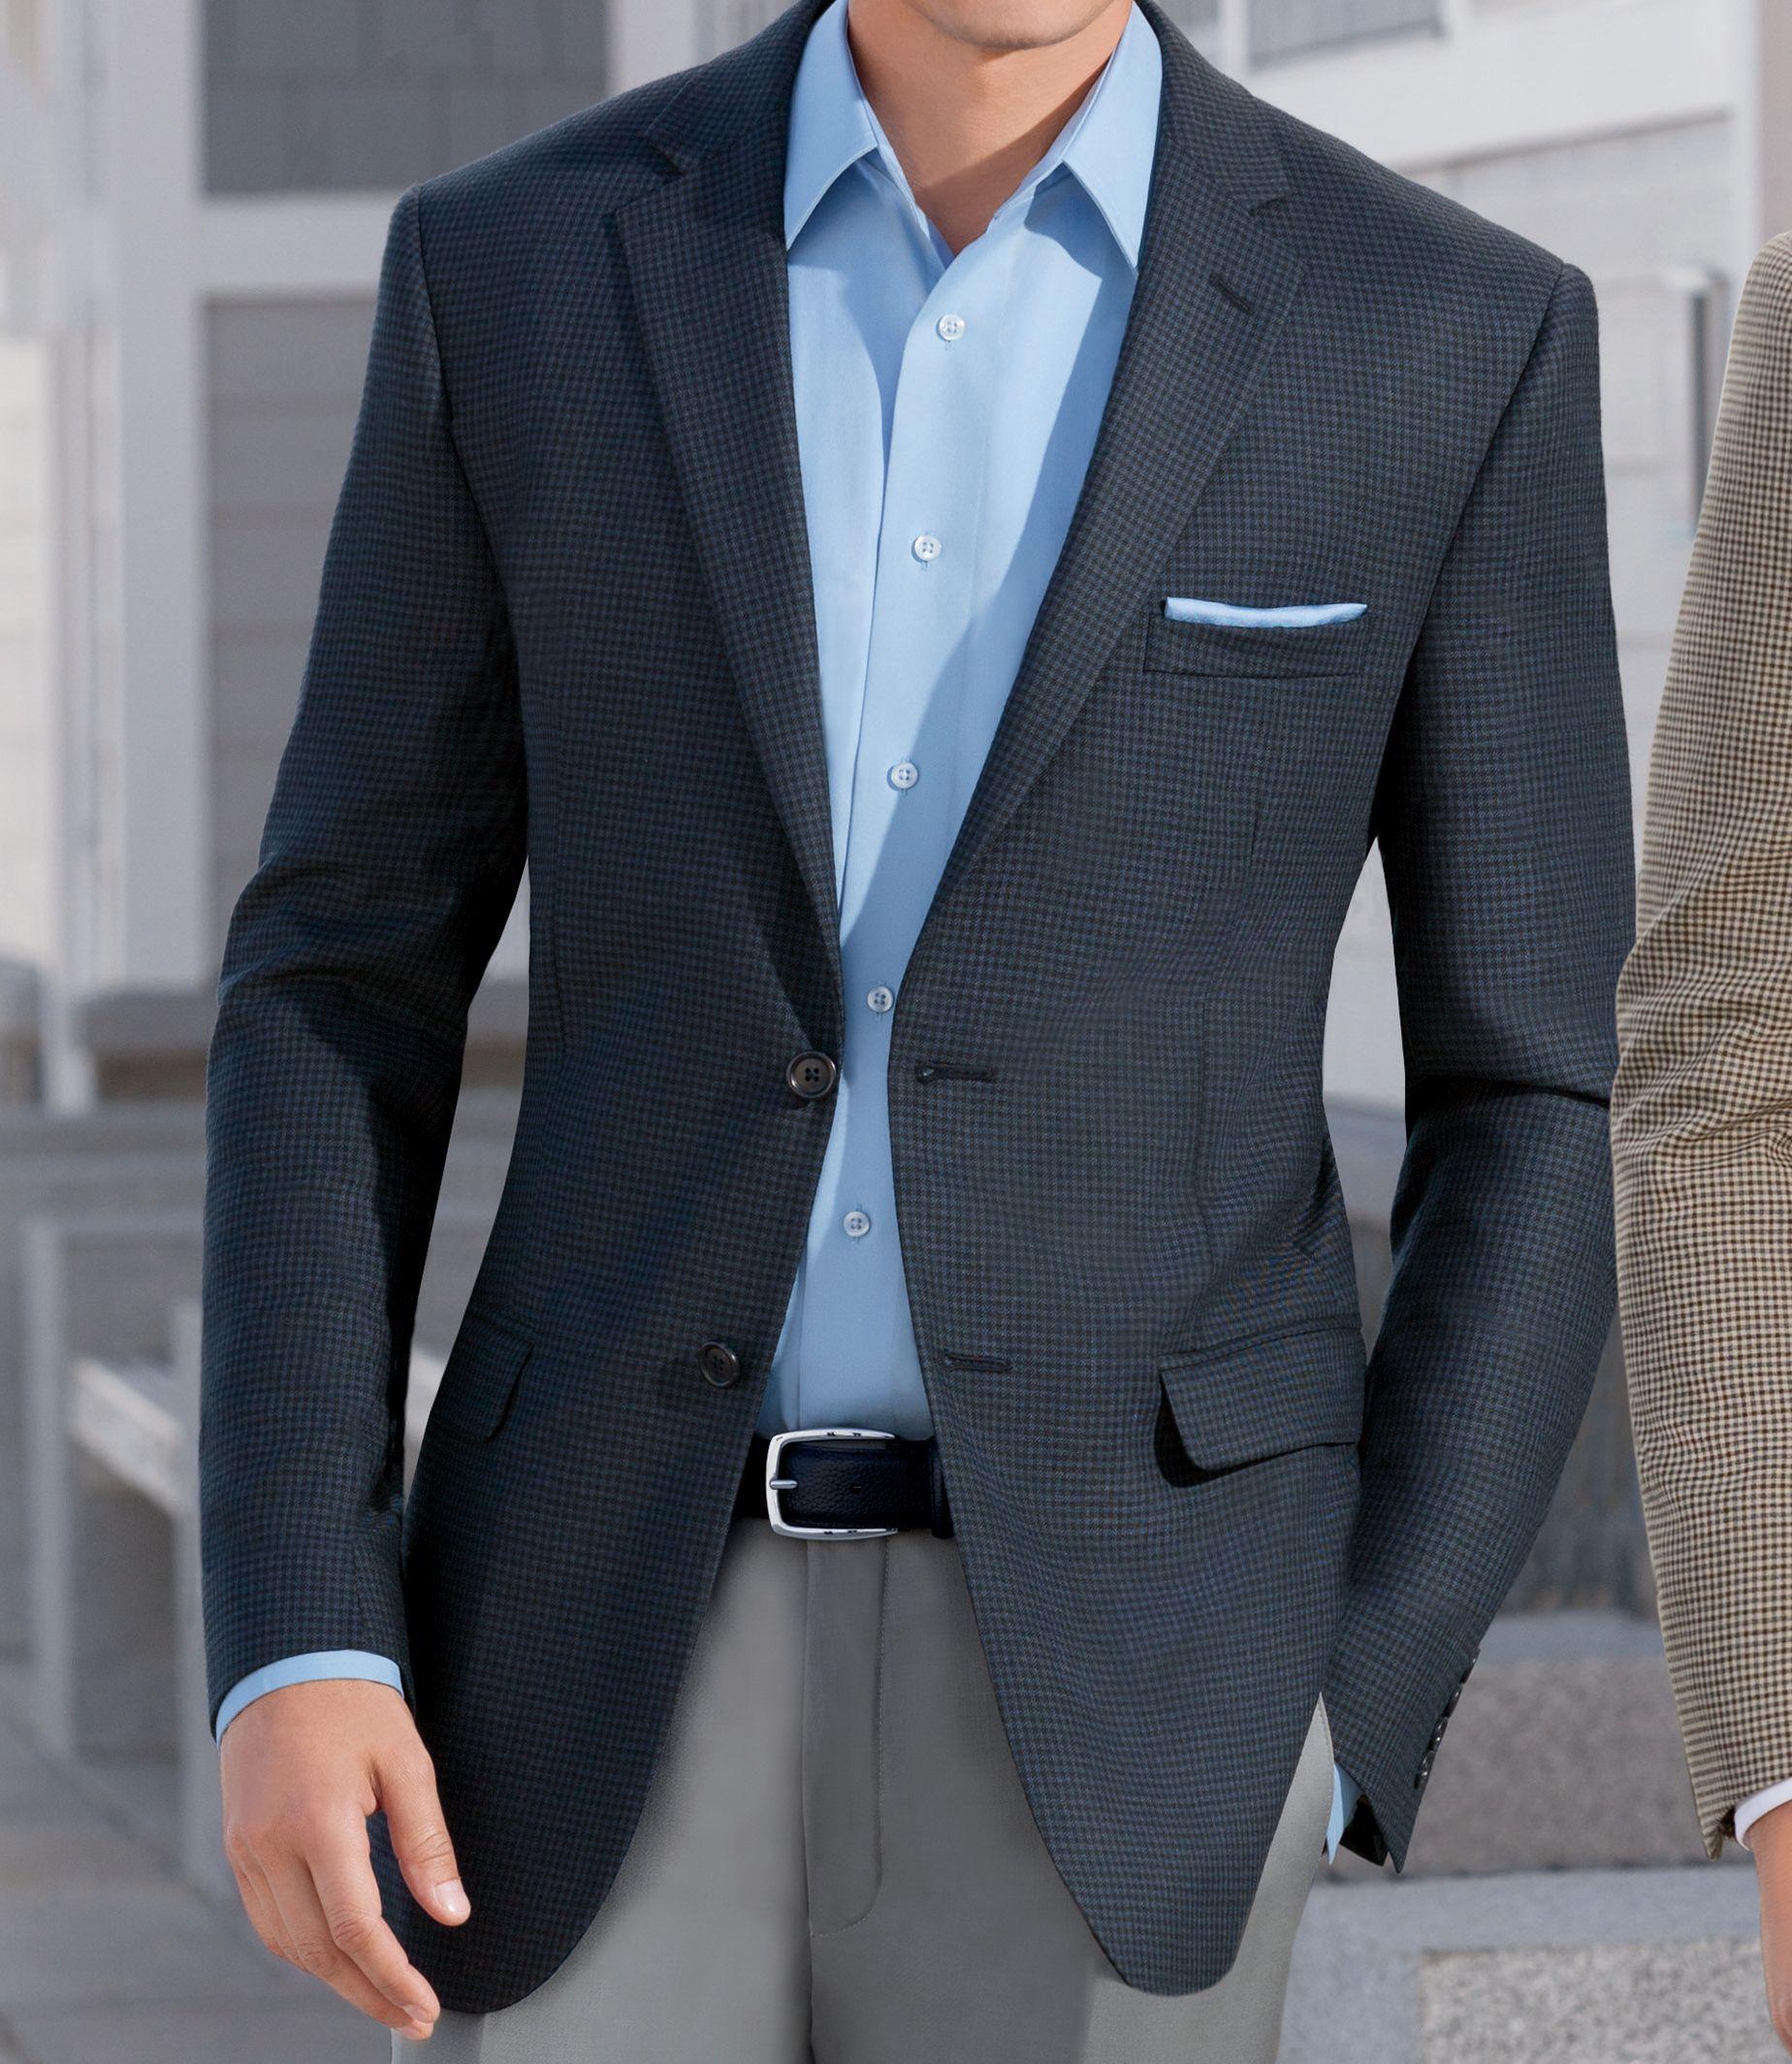 Joseph 2 Button Slim Fit Sportcoat CLEARANCE